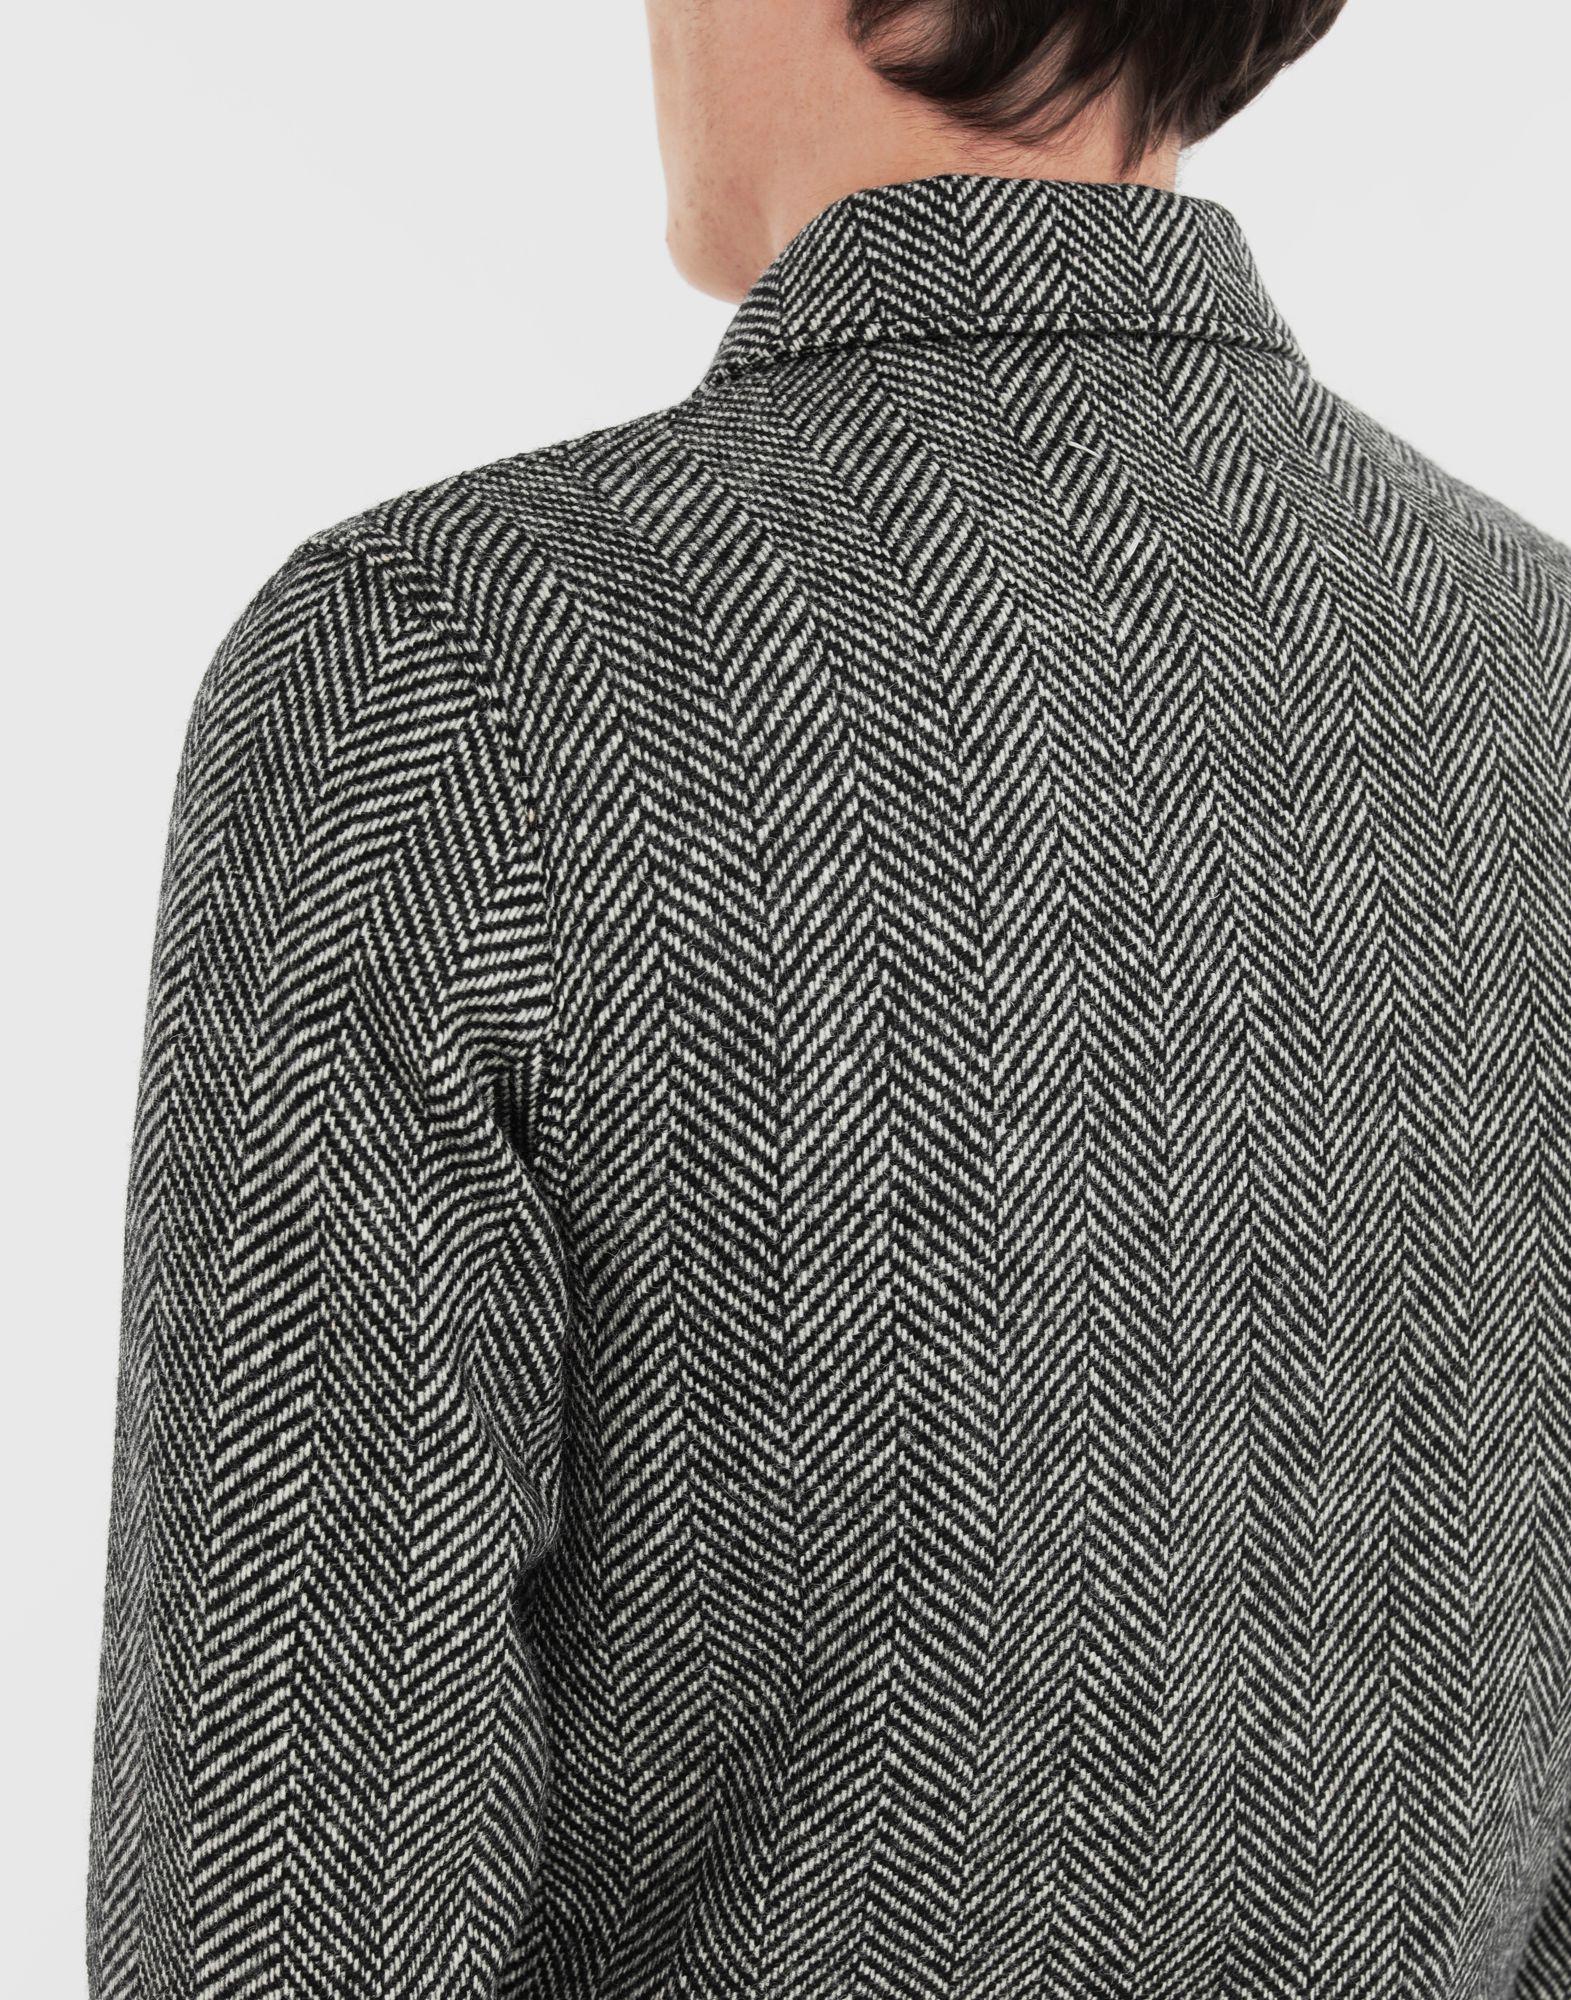 MAISON MARGIELA Décortiqué herringbone jacket Jacket Man b